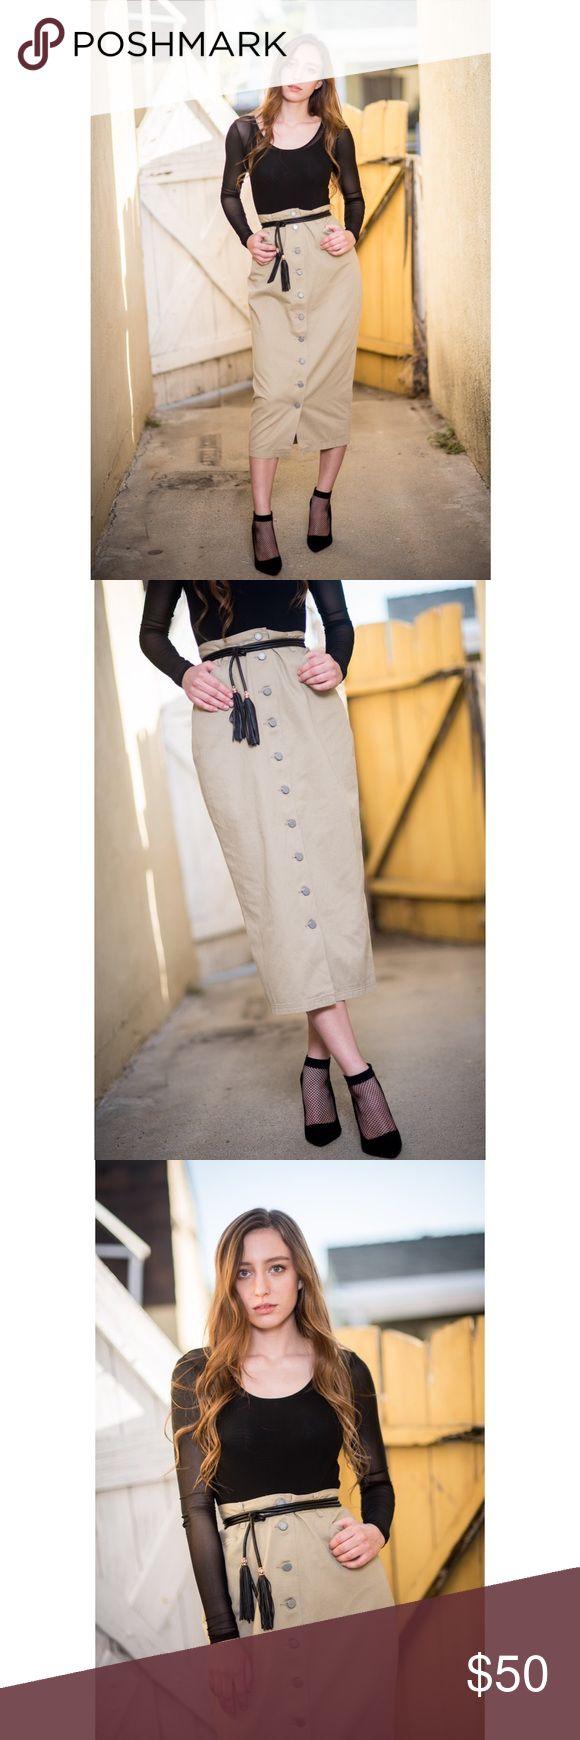 "beige button up high waisted skirt New York and company khaki button up high waisted skirt 💕 (does not include belt) Measurements• waist across: 13.75""•hips across: 18""• length: 34""•has pockets• 100% cotton• New York & Company Skirts Pencil"